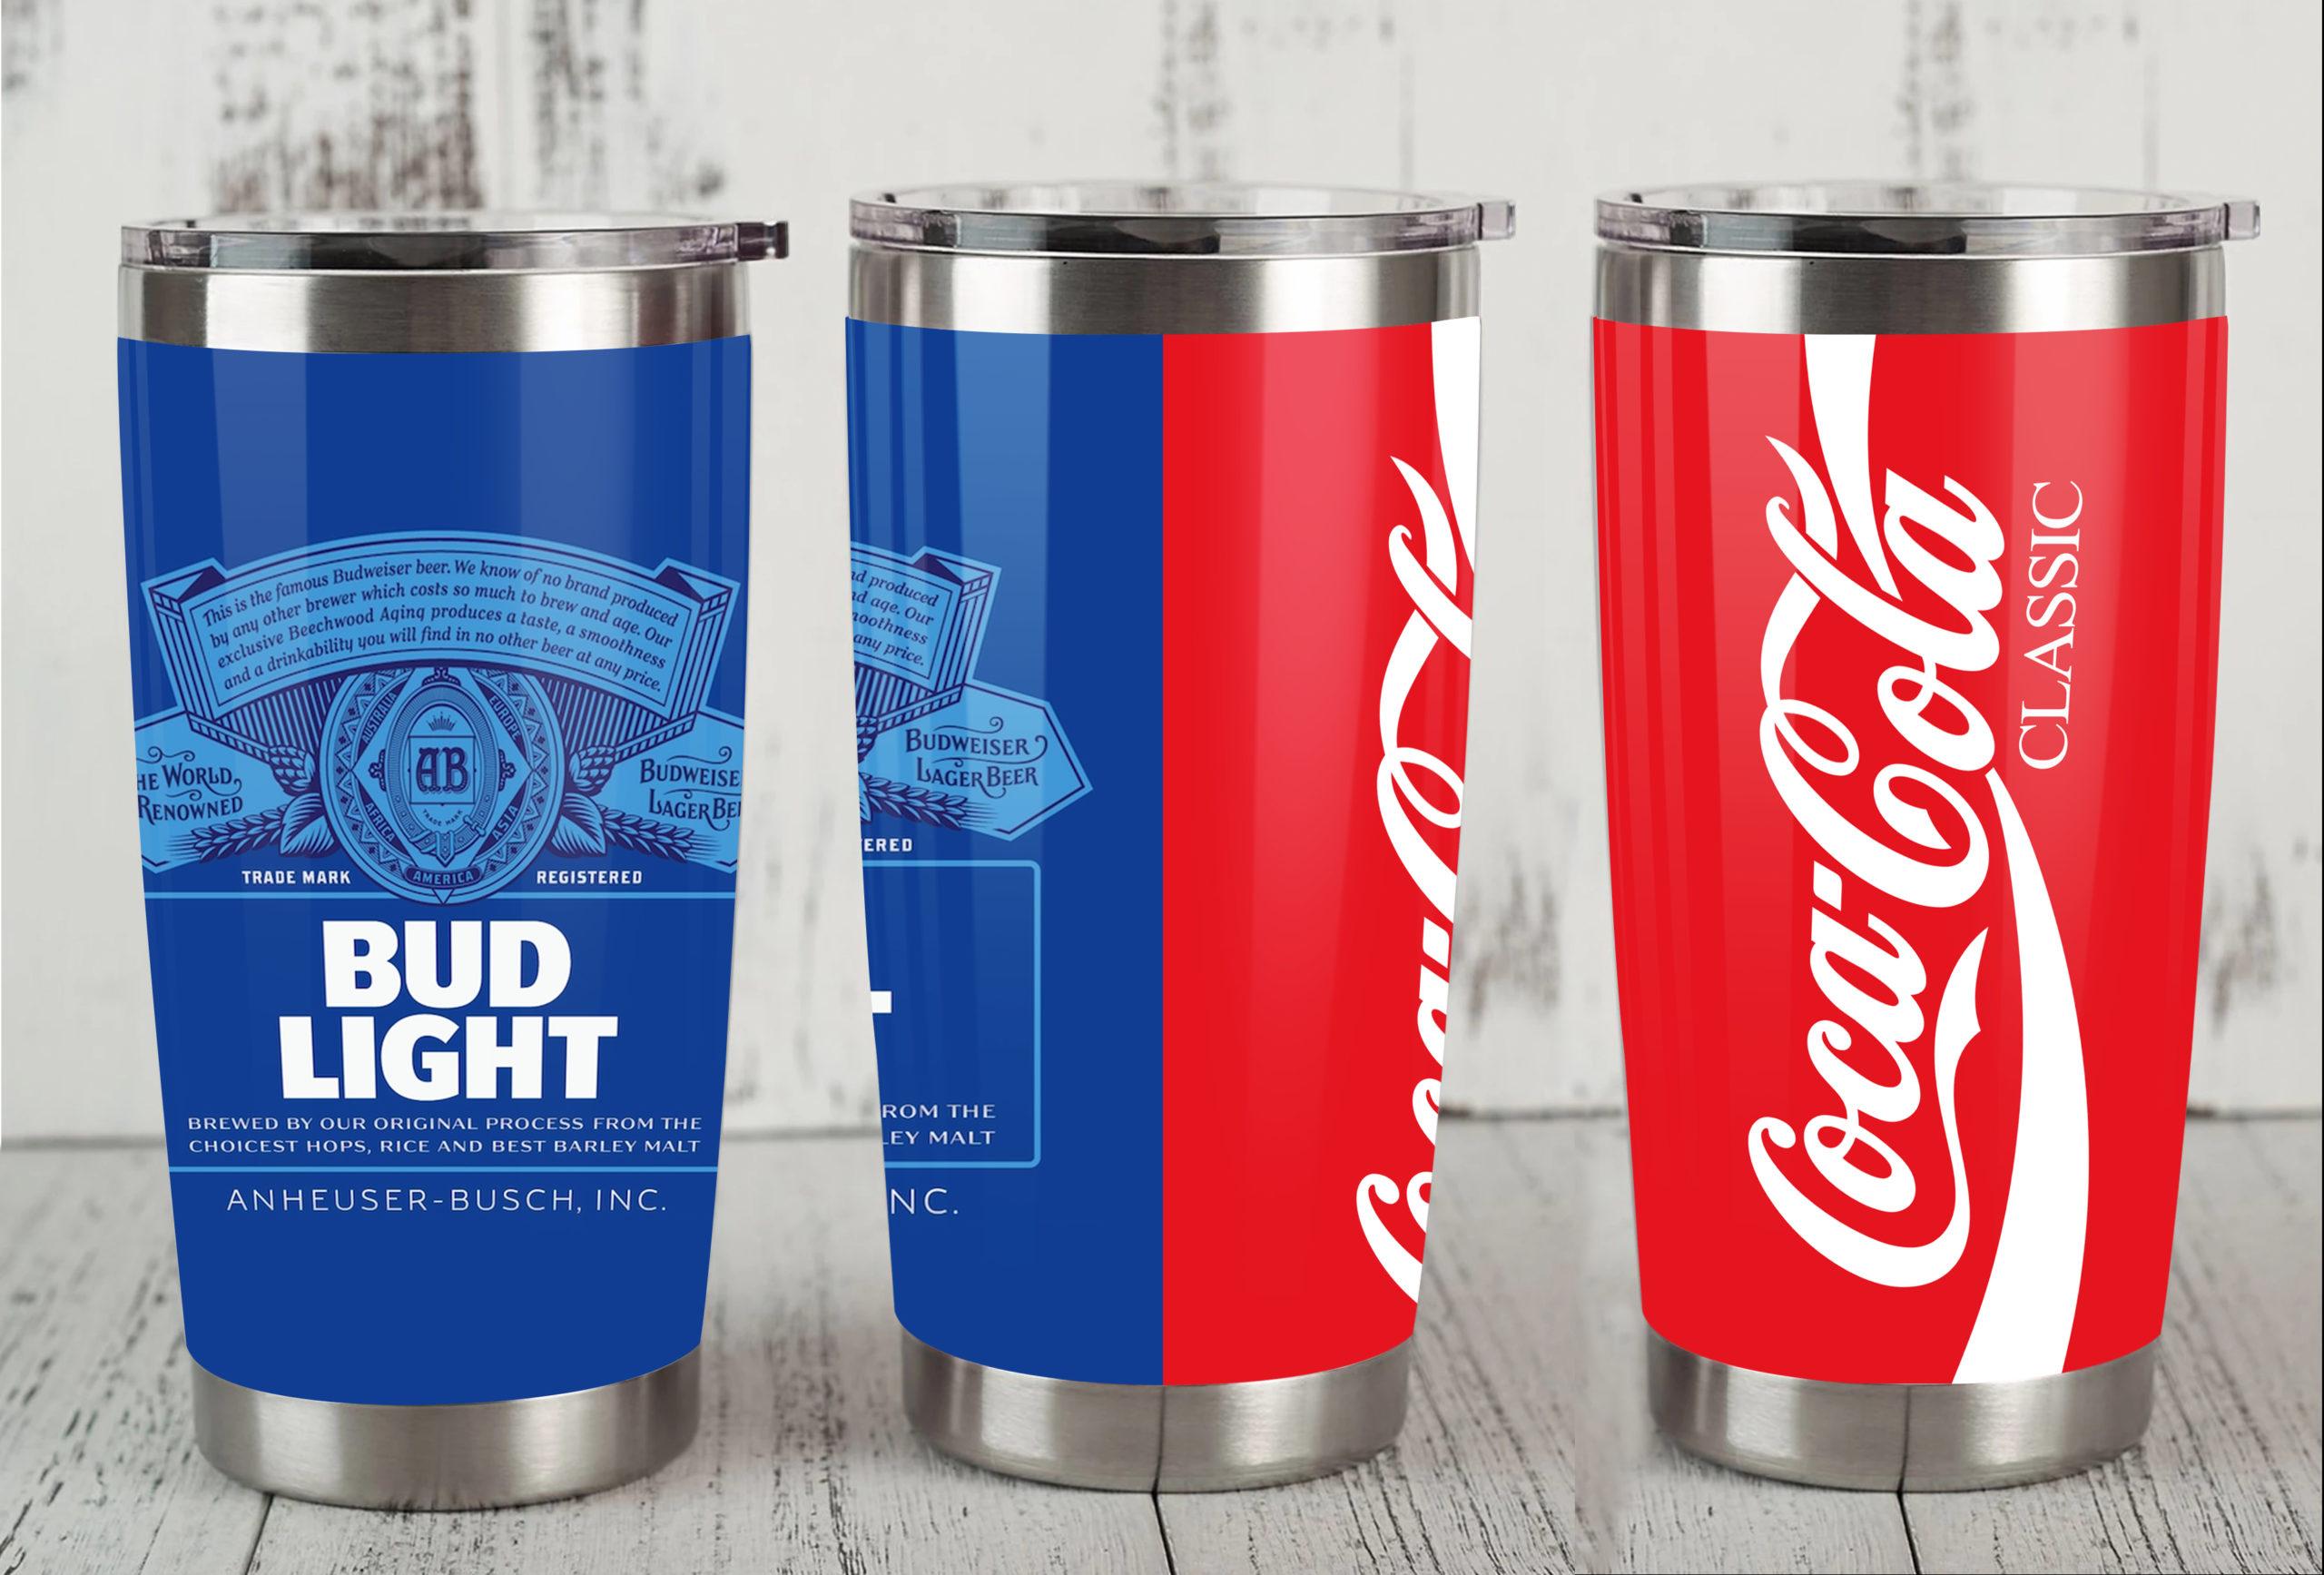 Bud light coca cola all over print tumbler 1